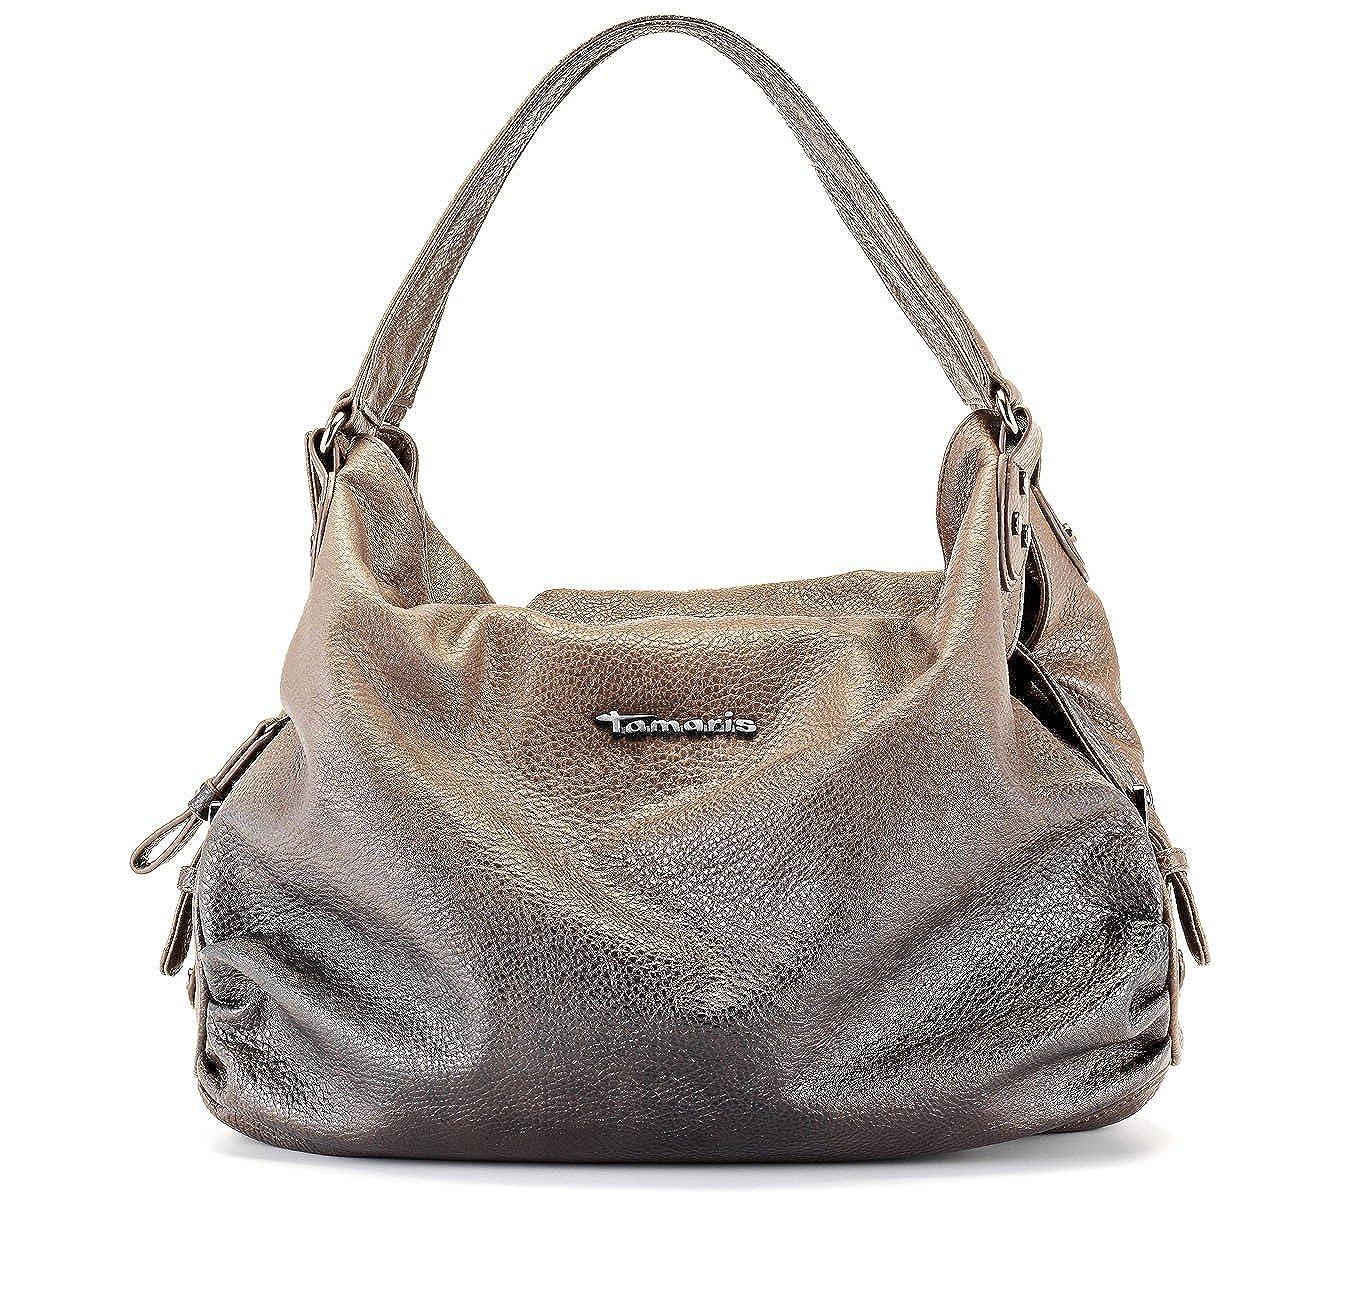 TAMARIS Handtasche, Schultertasche, 3 Farben: antelope beige